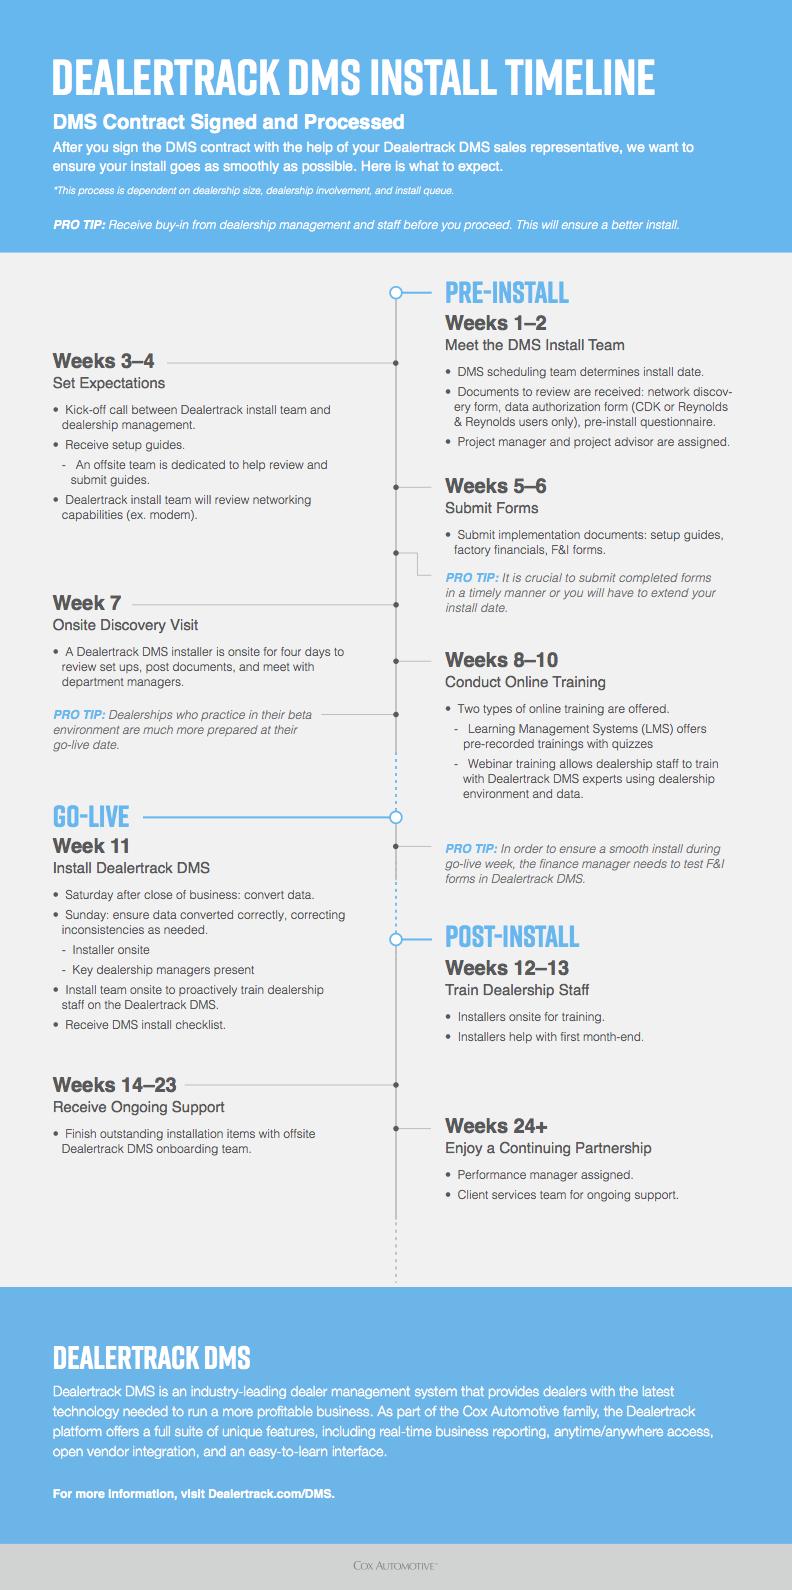 DLR17-0143_Install_Infographic_Digital_V2.png